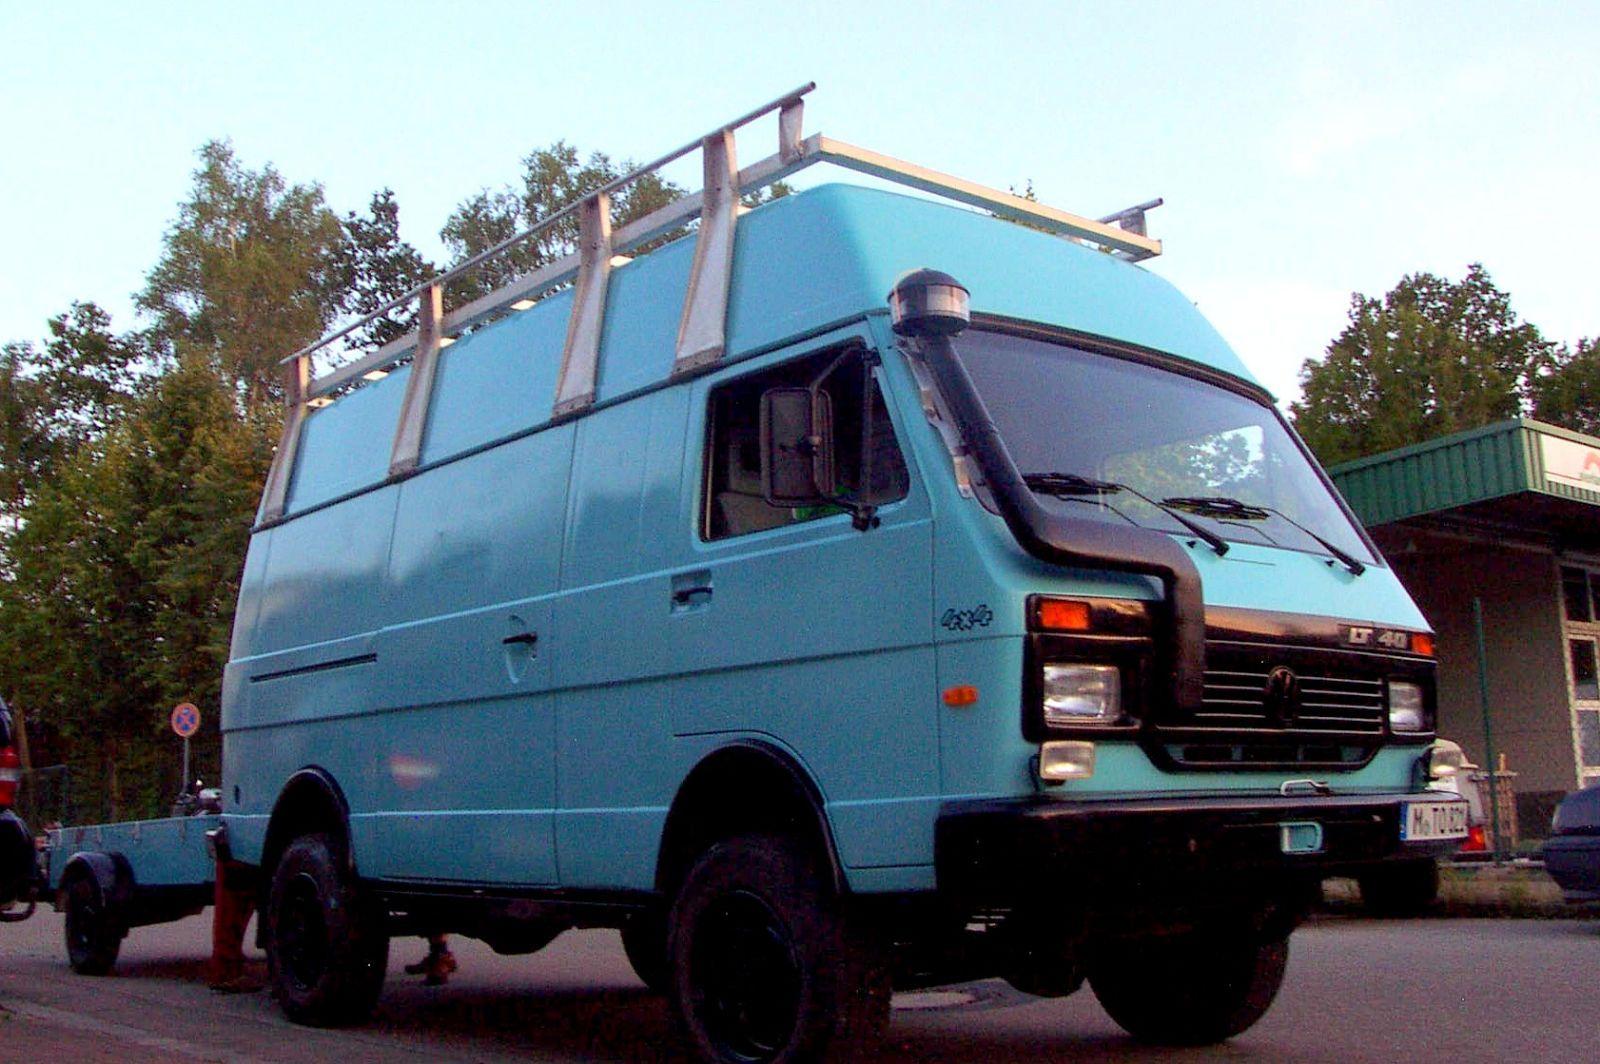 vw lt40 4x4 vehicles mix pinterest 4x4 volkswagen and vw bus